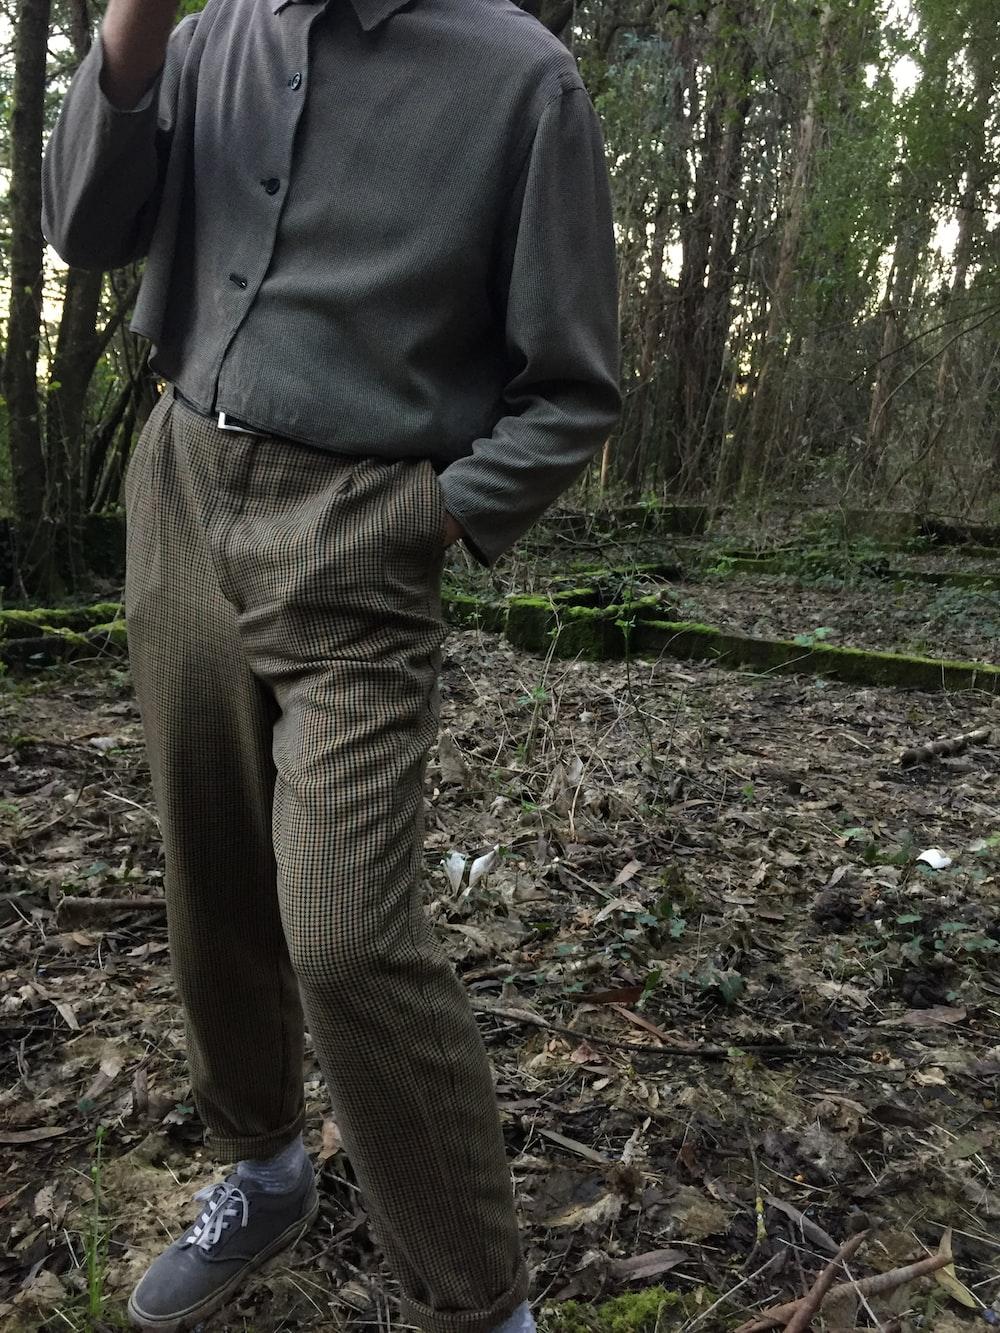 person wearing grey dress shirt and brown pants